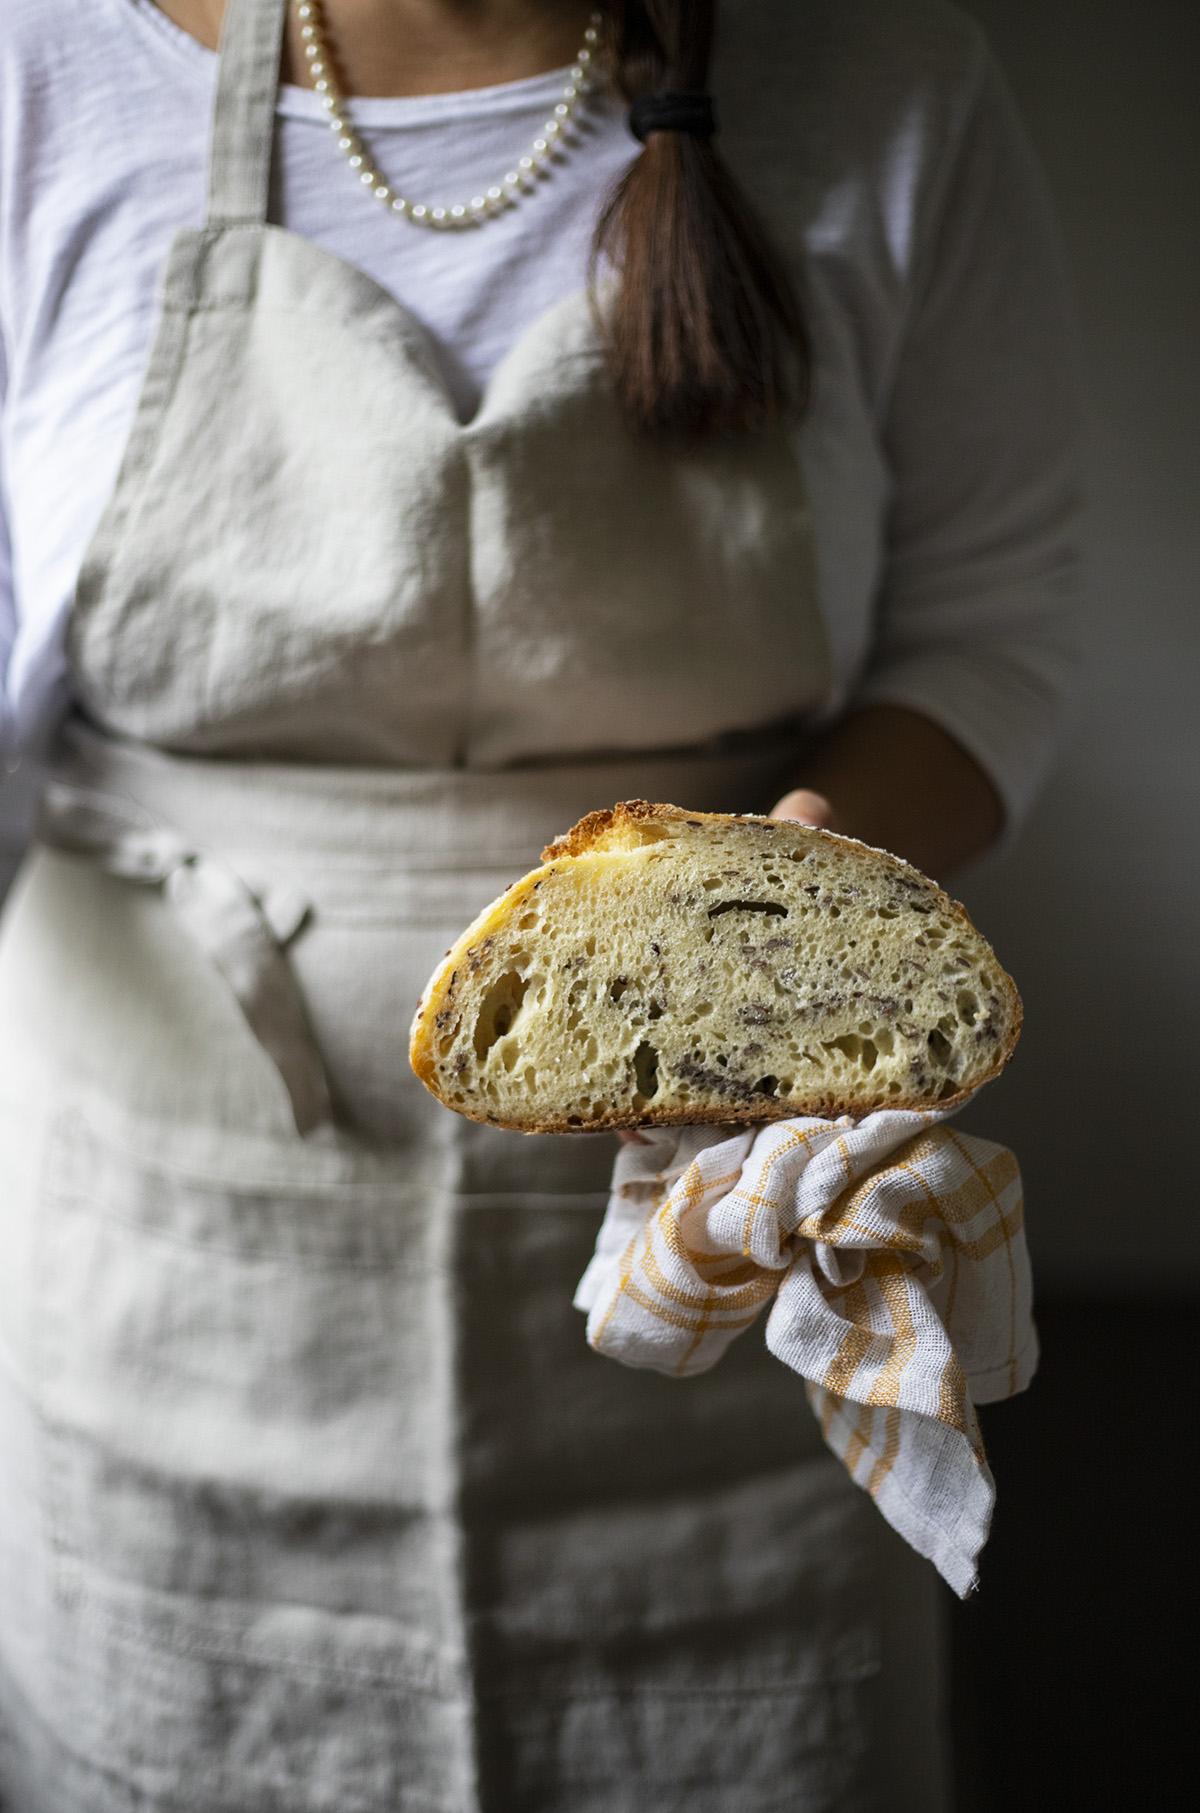 Pane con farina di mais